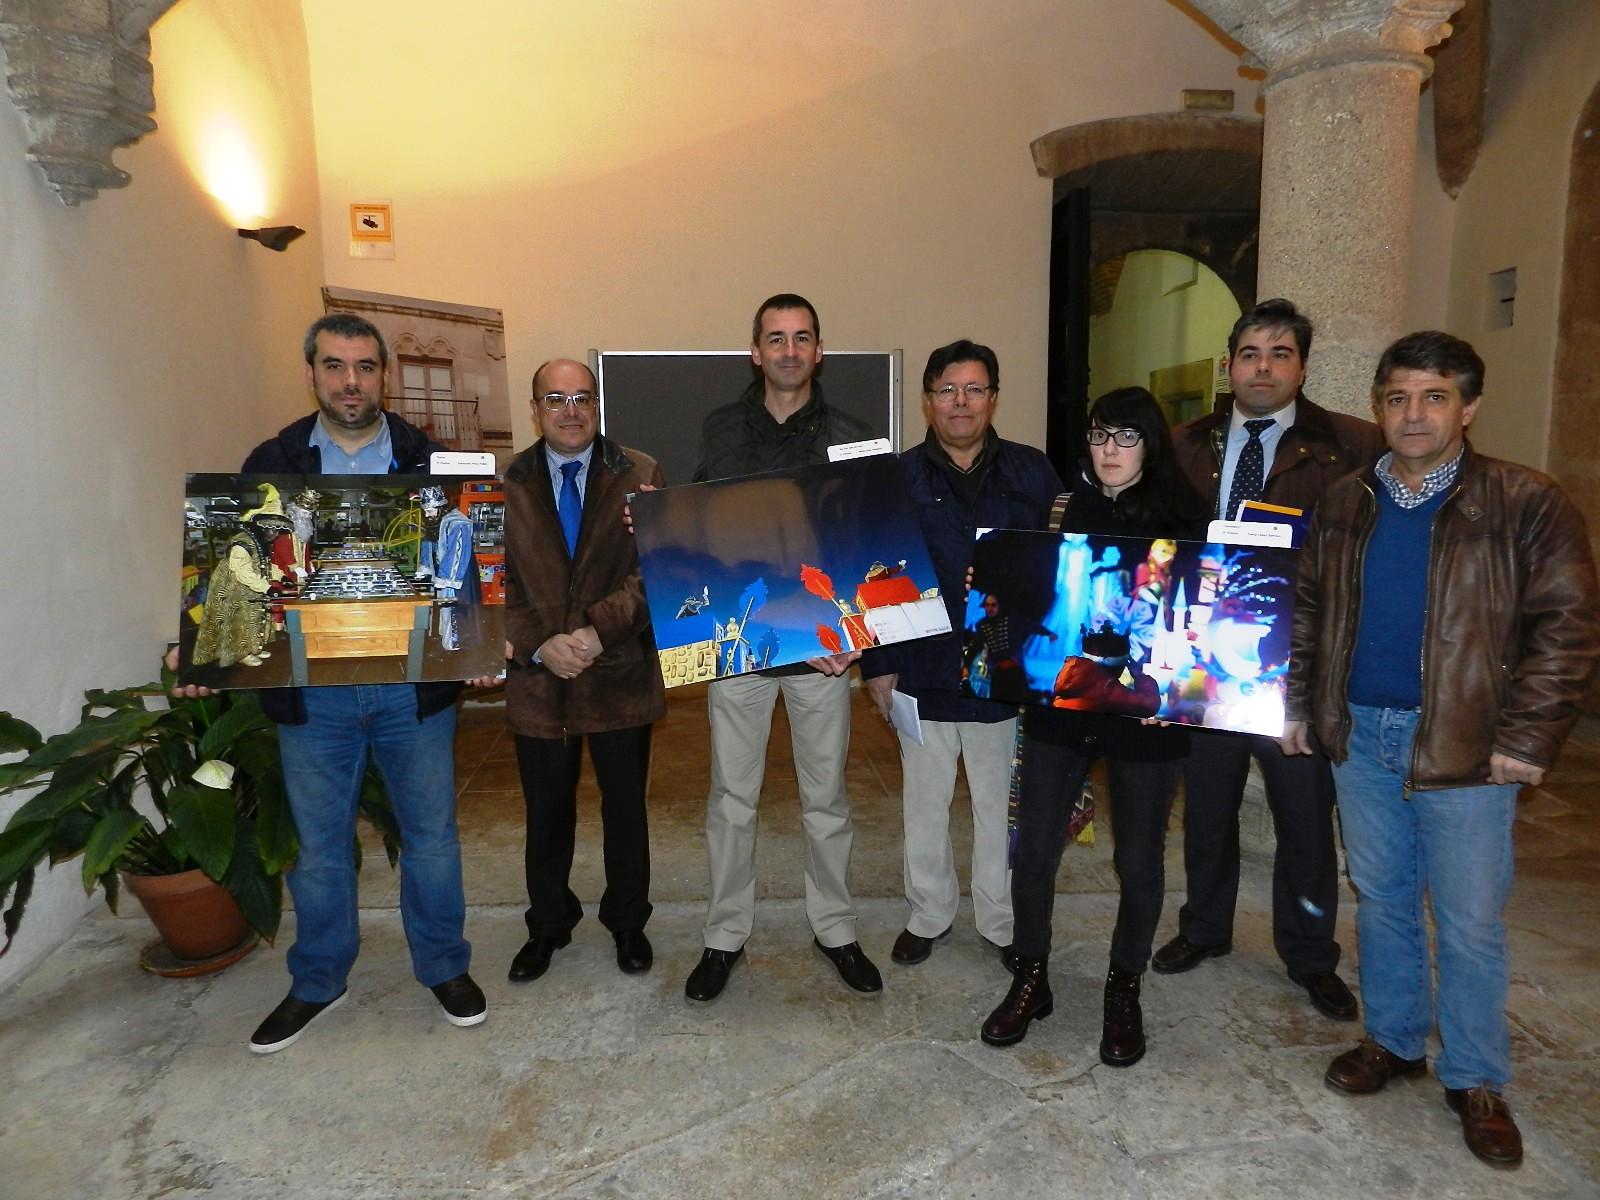 Concurso Reyes Magos 2016